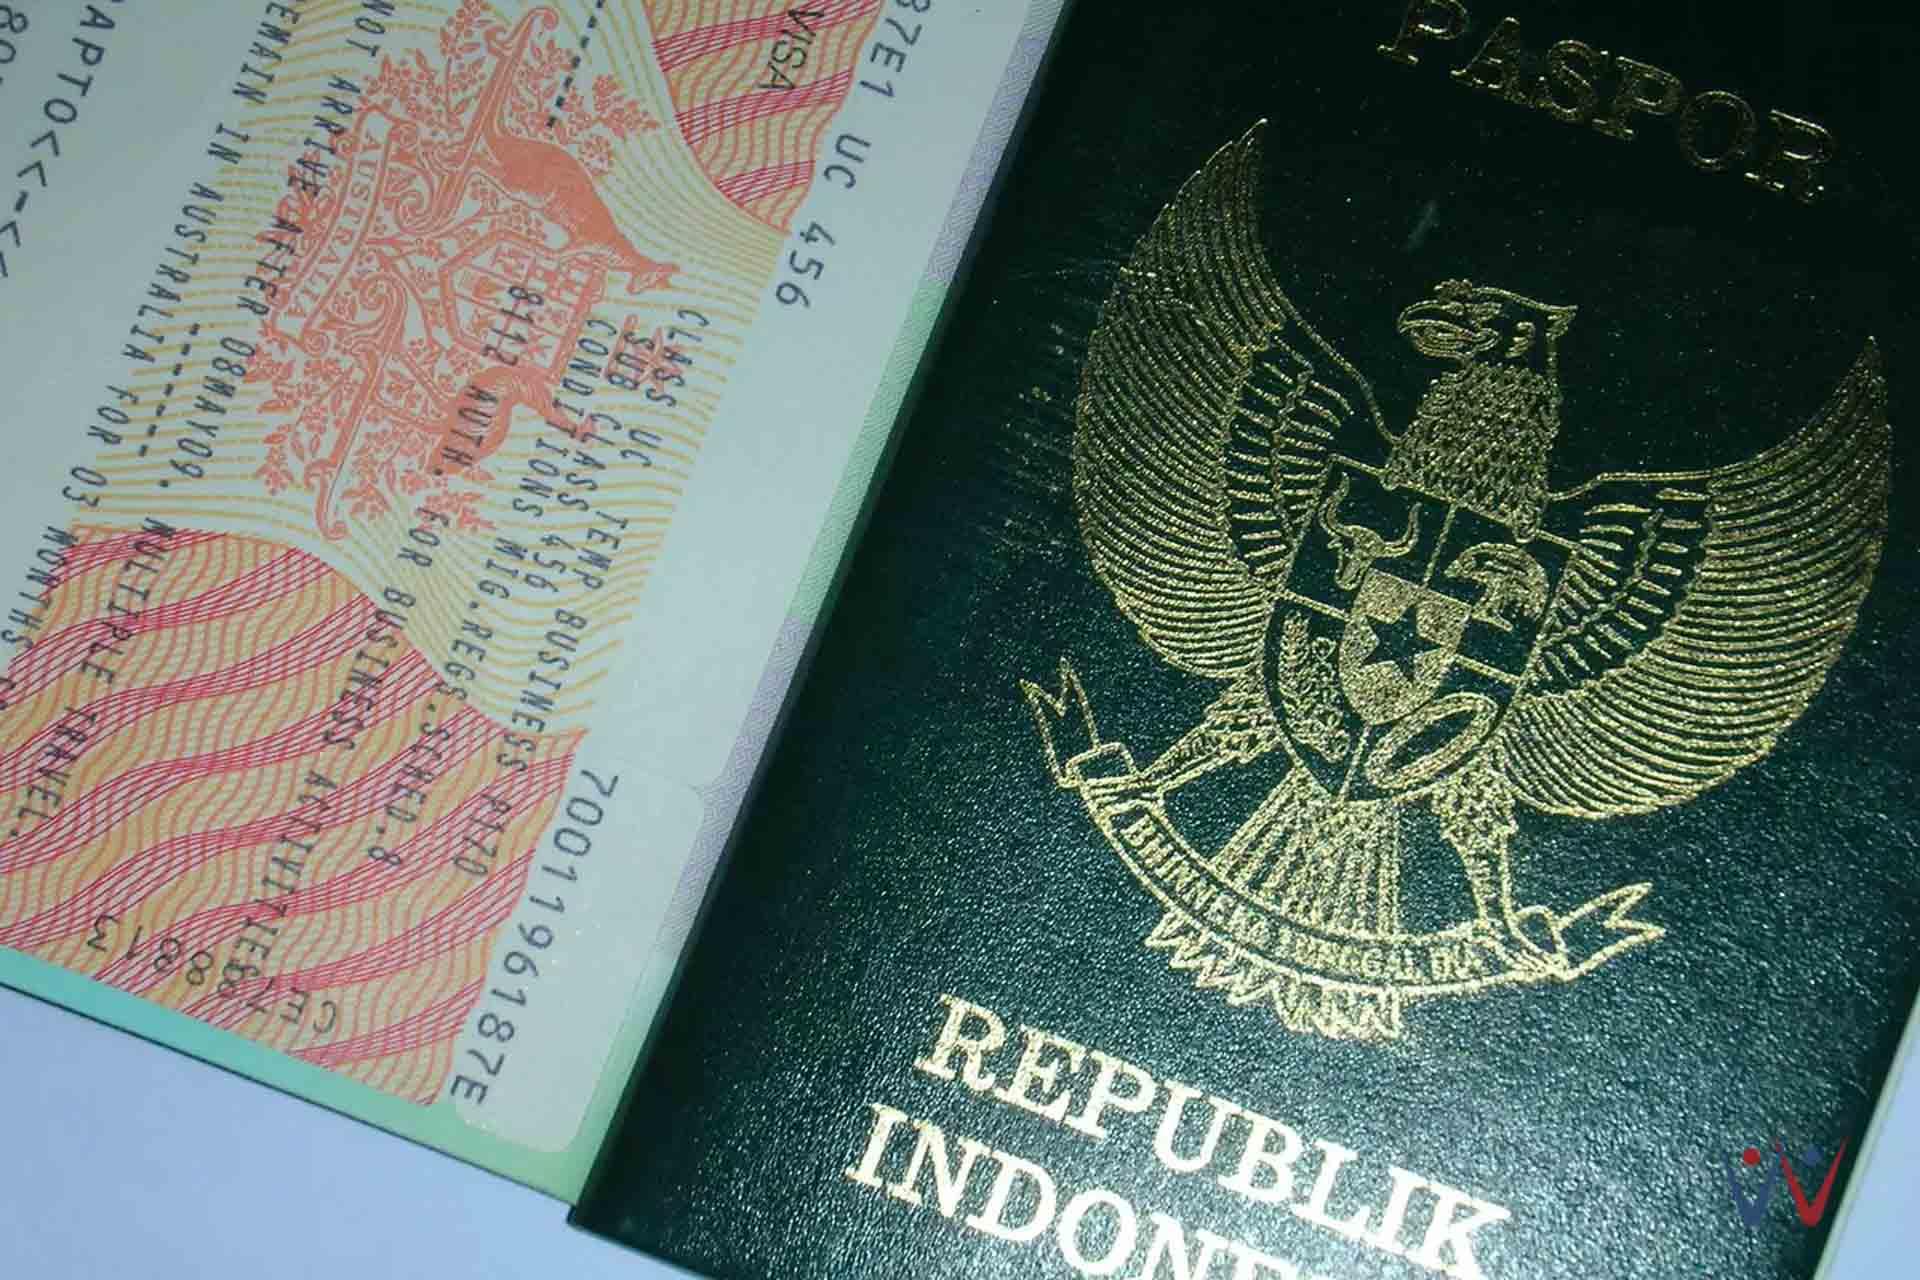 daftar paspor onlien - antrian paspor online - perpanjang paspor online - 4